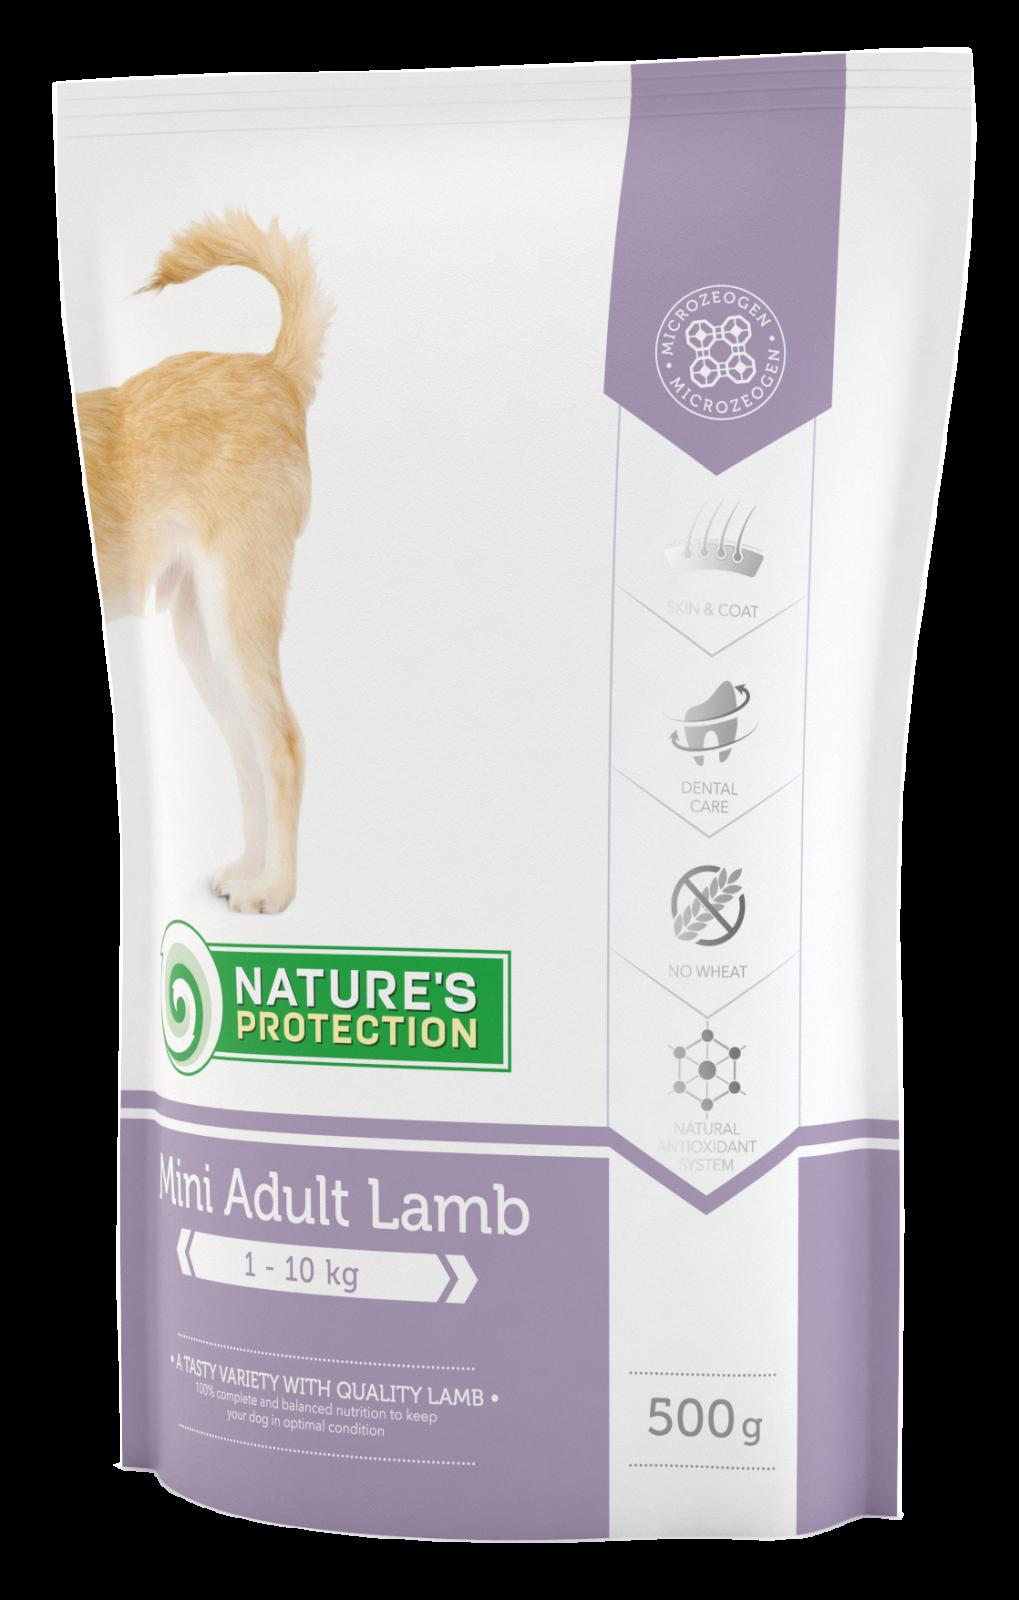 Nature's Protection Dog Mini Adult Lamb 500g